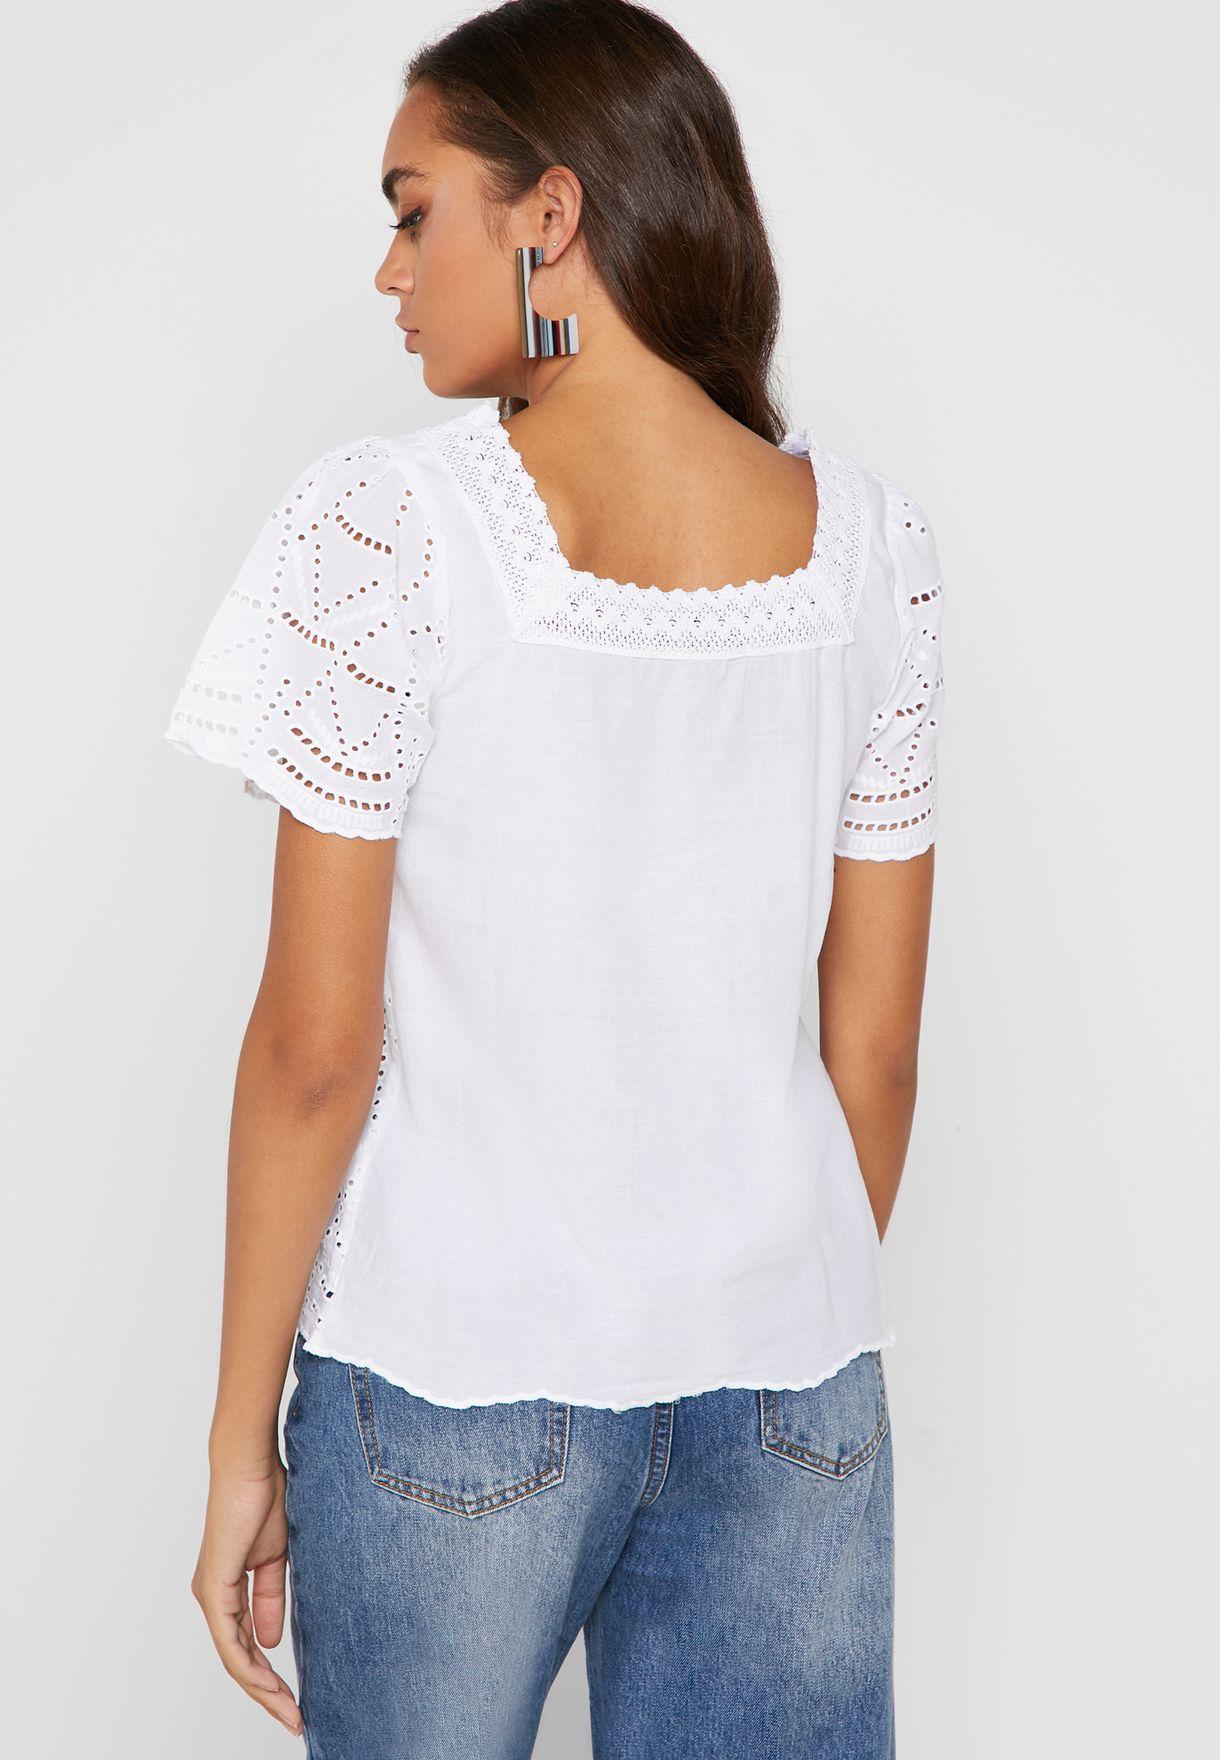 Square Neck Lace Detail Top